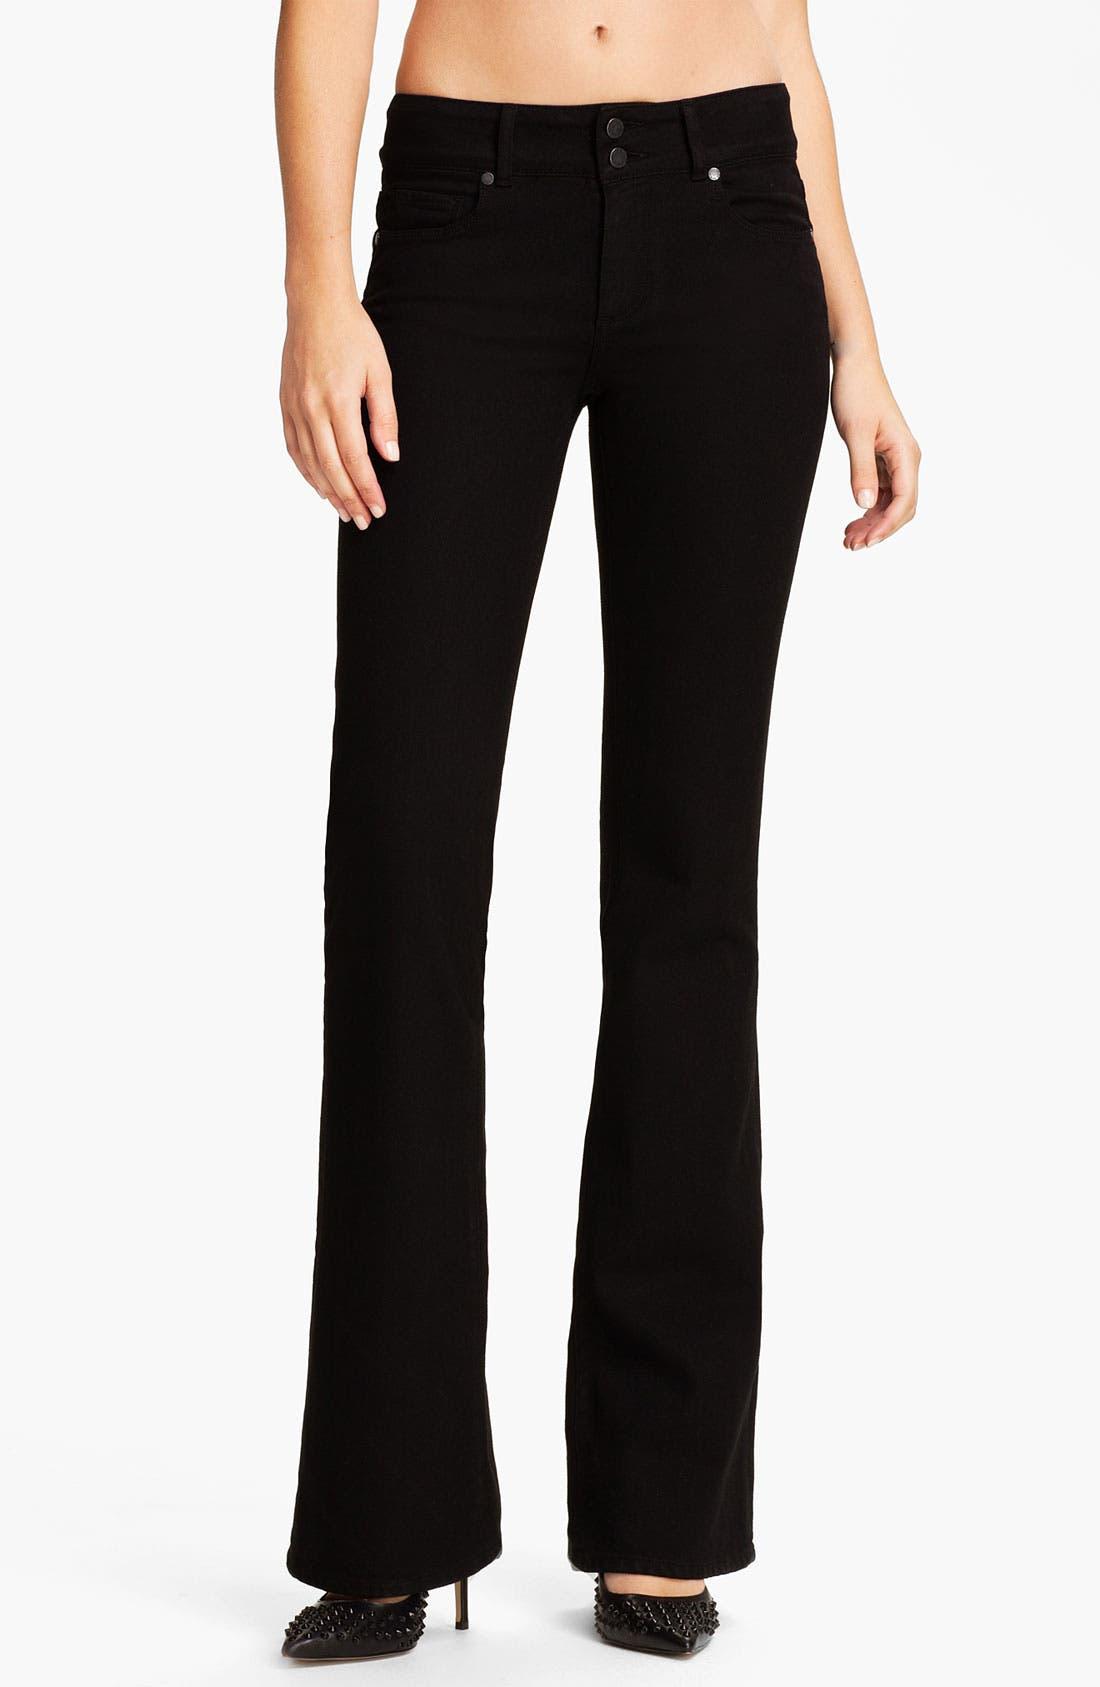 Main Image - Paige Denim 'Hidden Hills' Bootcut Stretch Jeans (Jet Black)